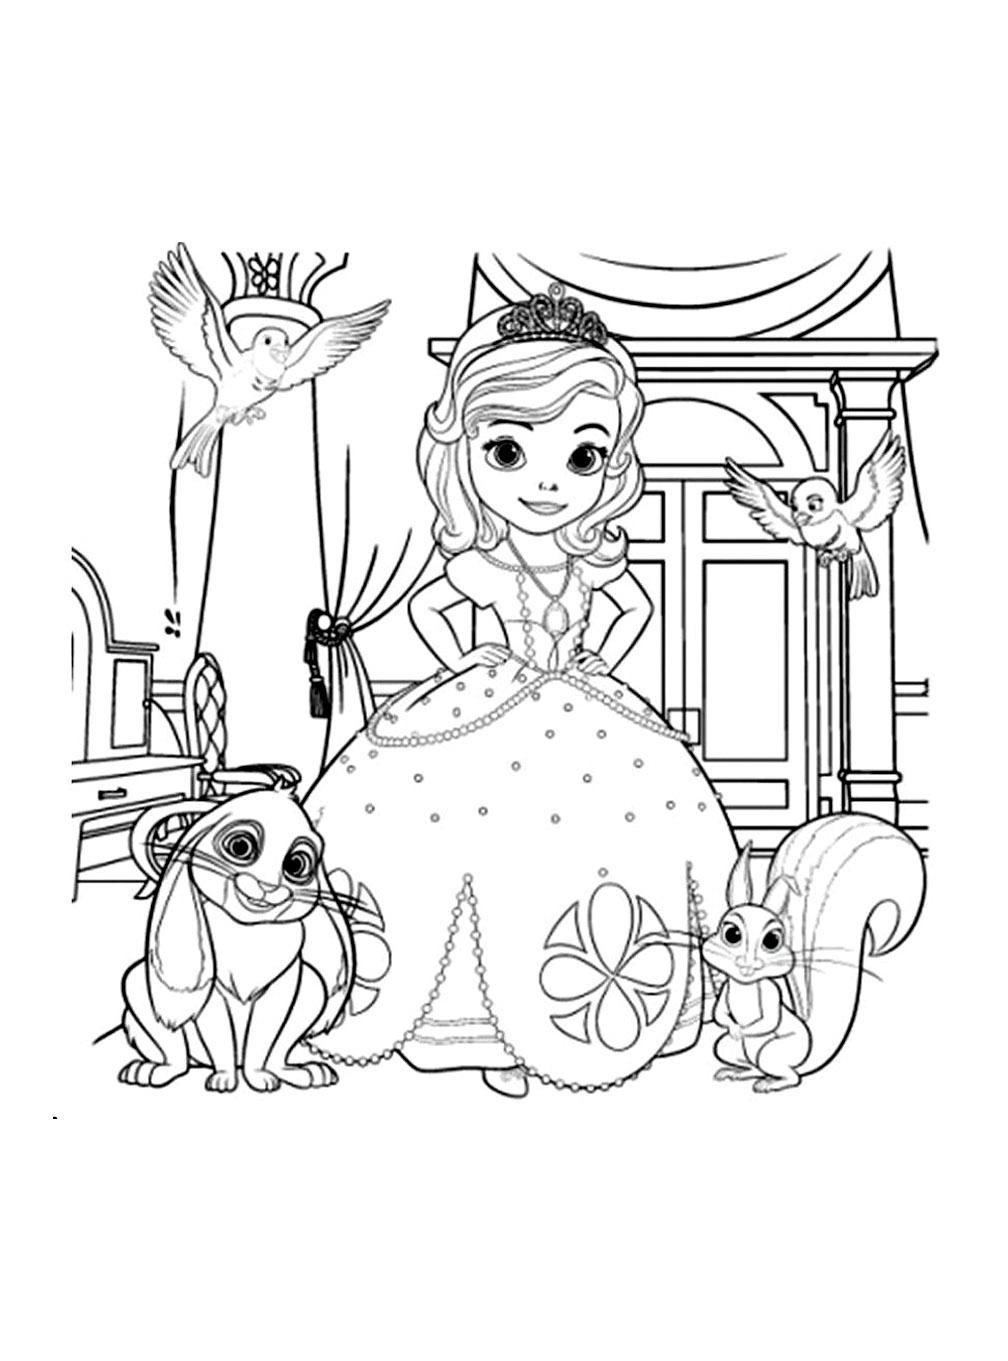 sofia et ses animauxa partir de la galerie princessesofia imprimer